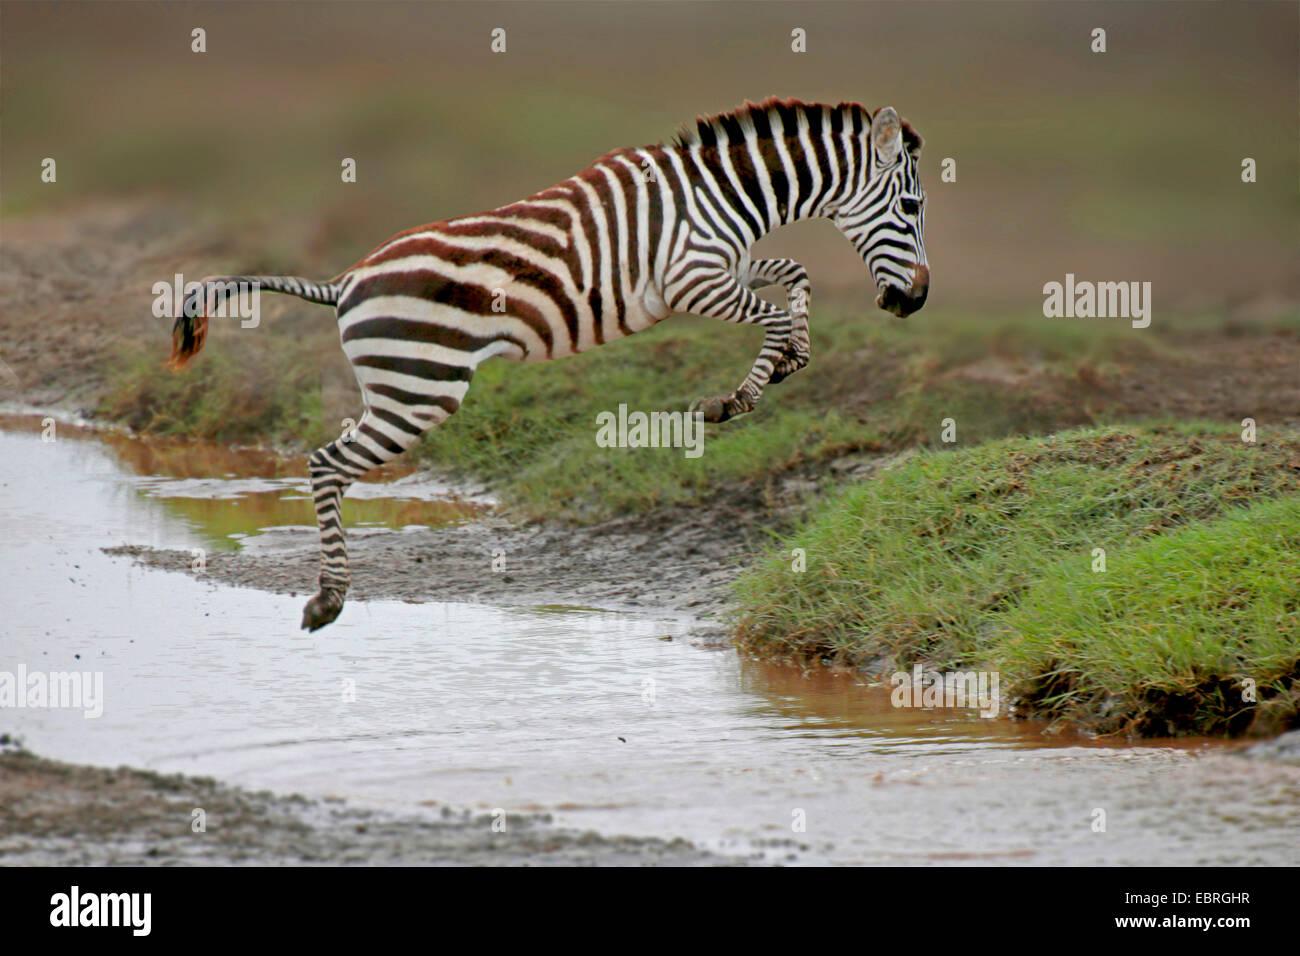 Gemeinsamen Zebra (Equus Quagga), springen über einen Bach, Tansania, Serengeti National Park Stockbild